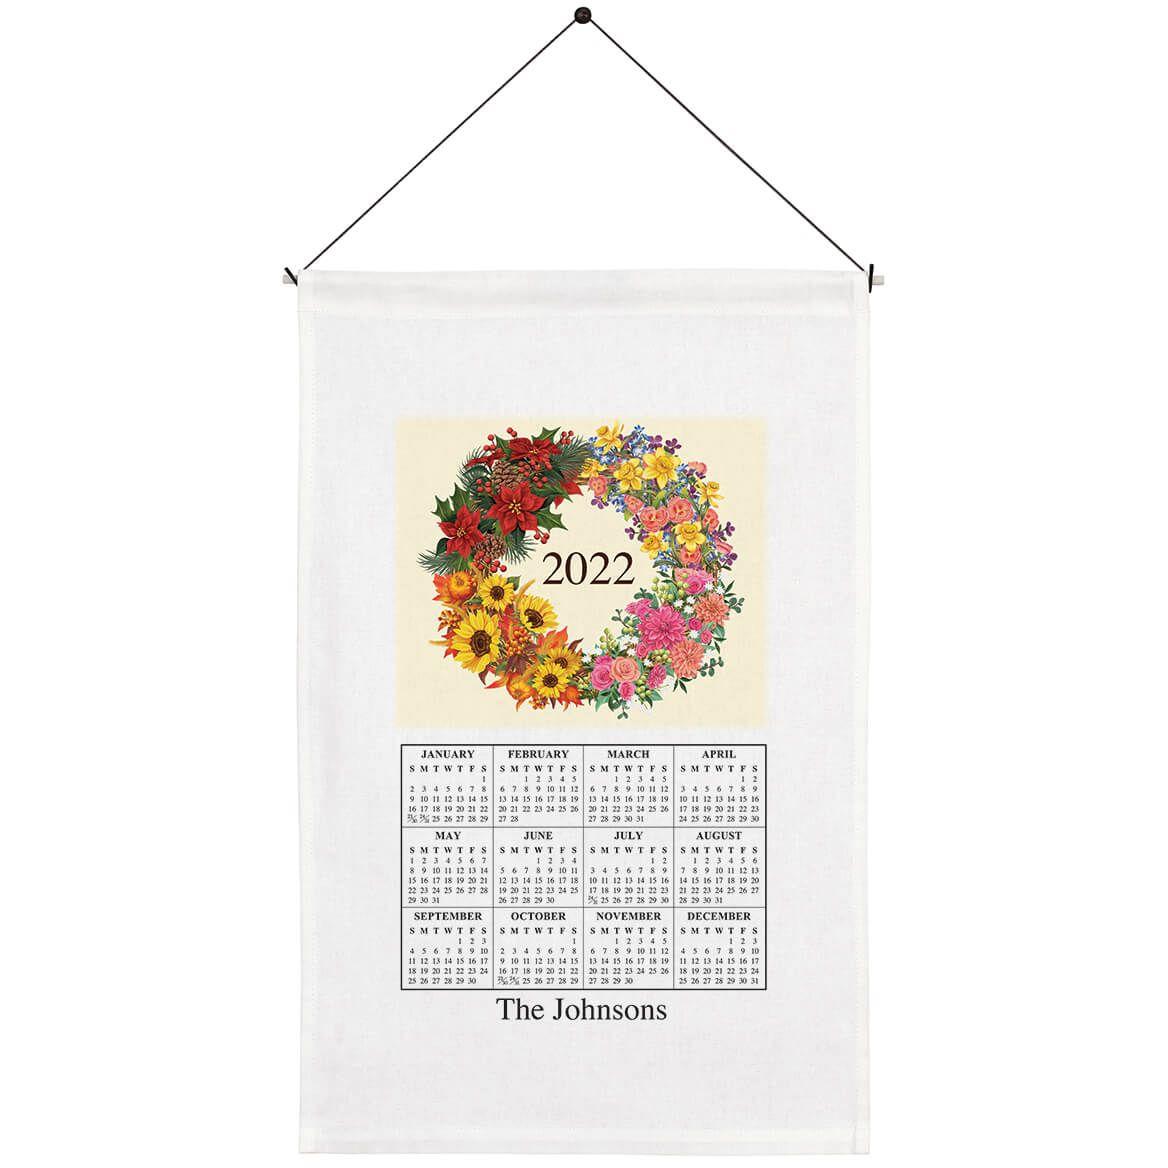 Personalized Four Seasons Wreath Calendar Towel-369595